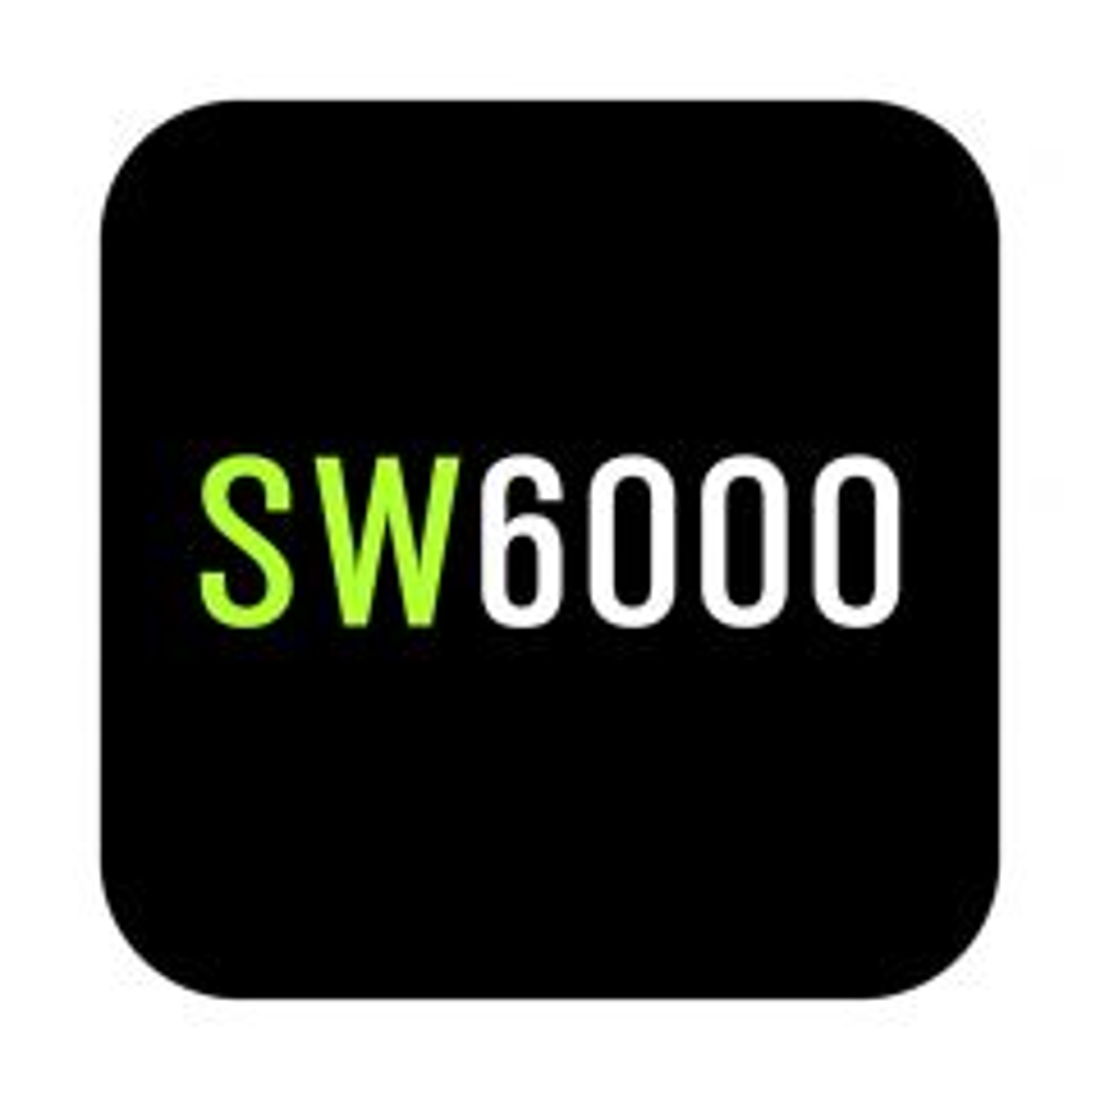 SW6000 Conference Management Software, Version 6.8 - Advanced Meeting Management Module (3800 Max. Meeting Participants)